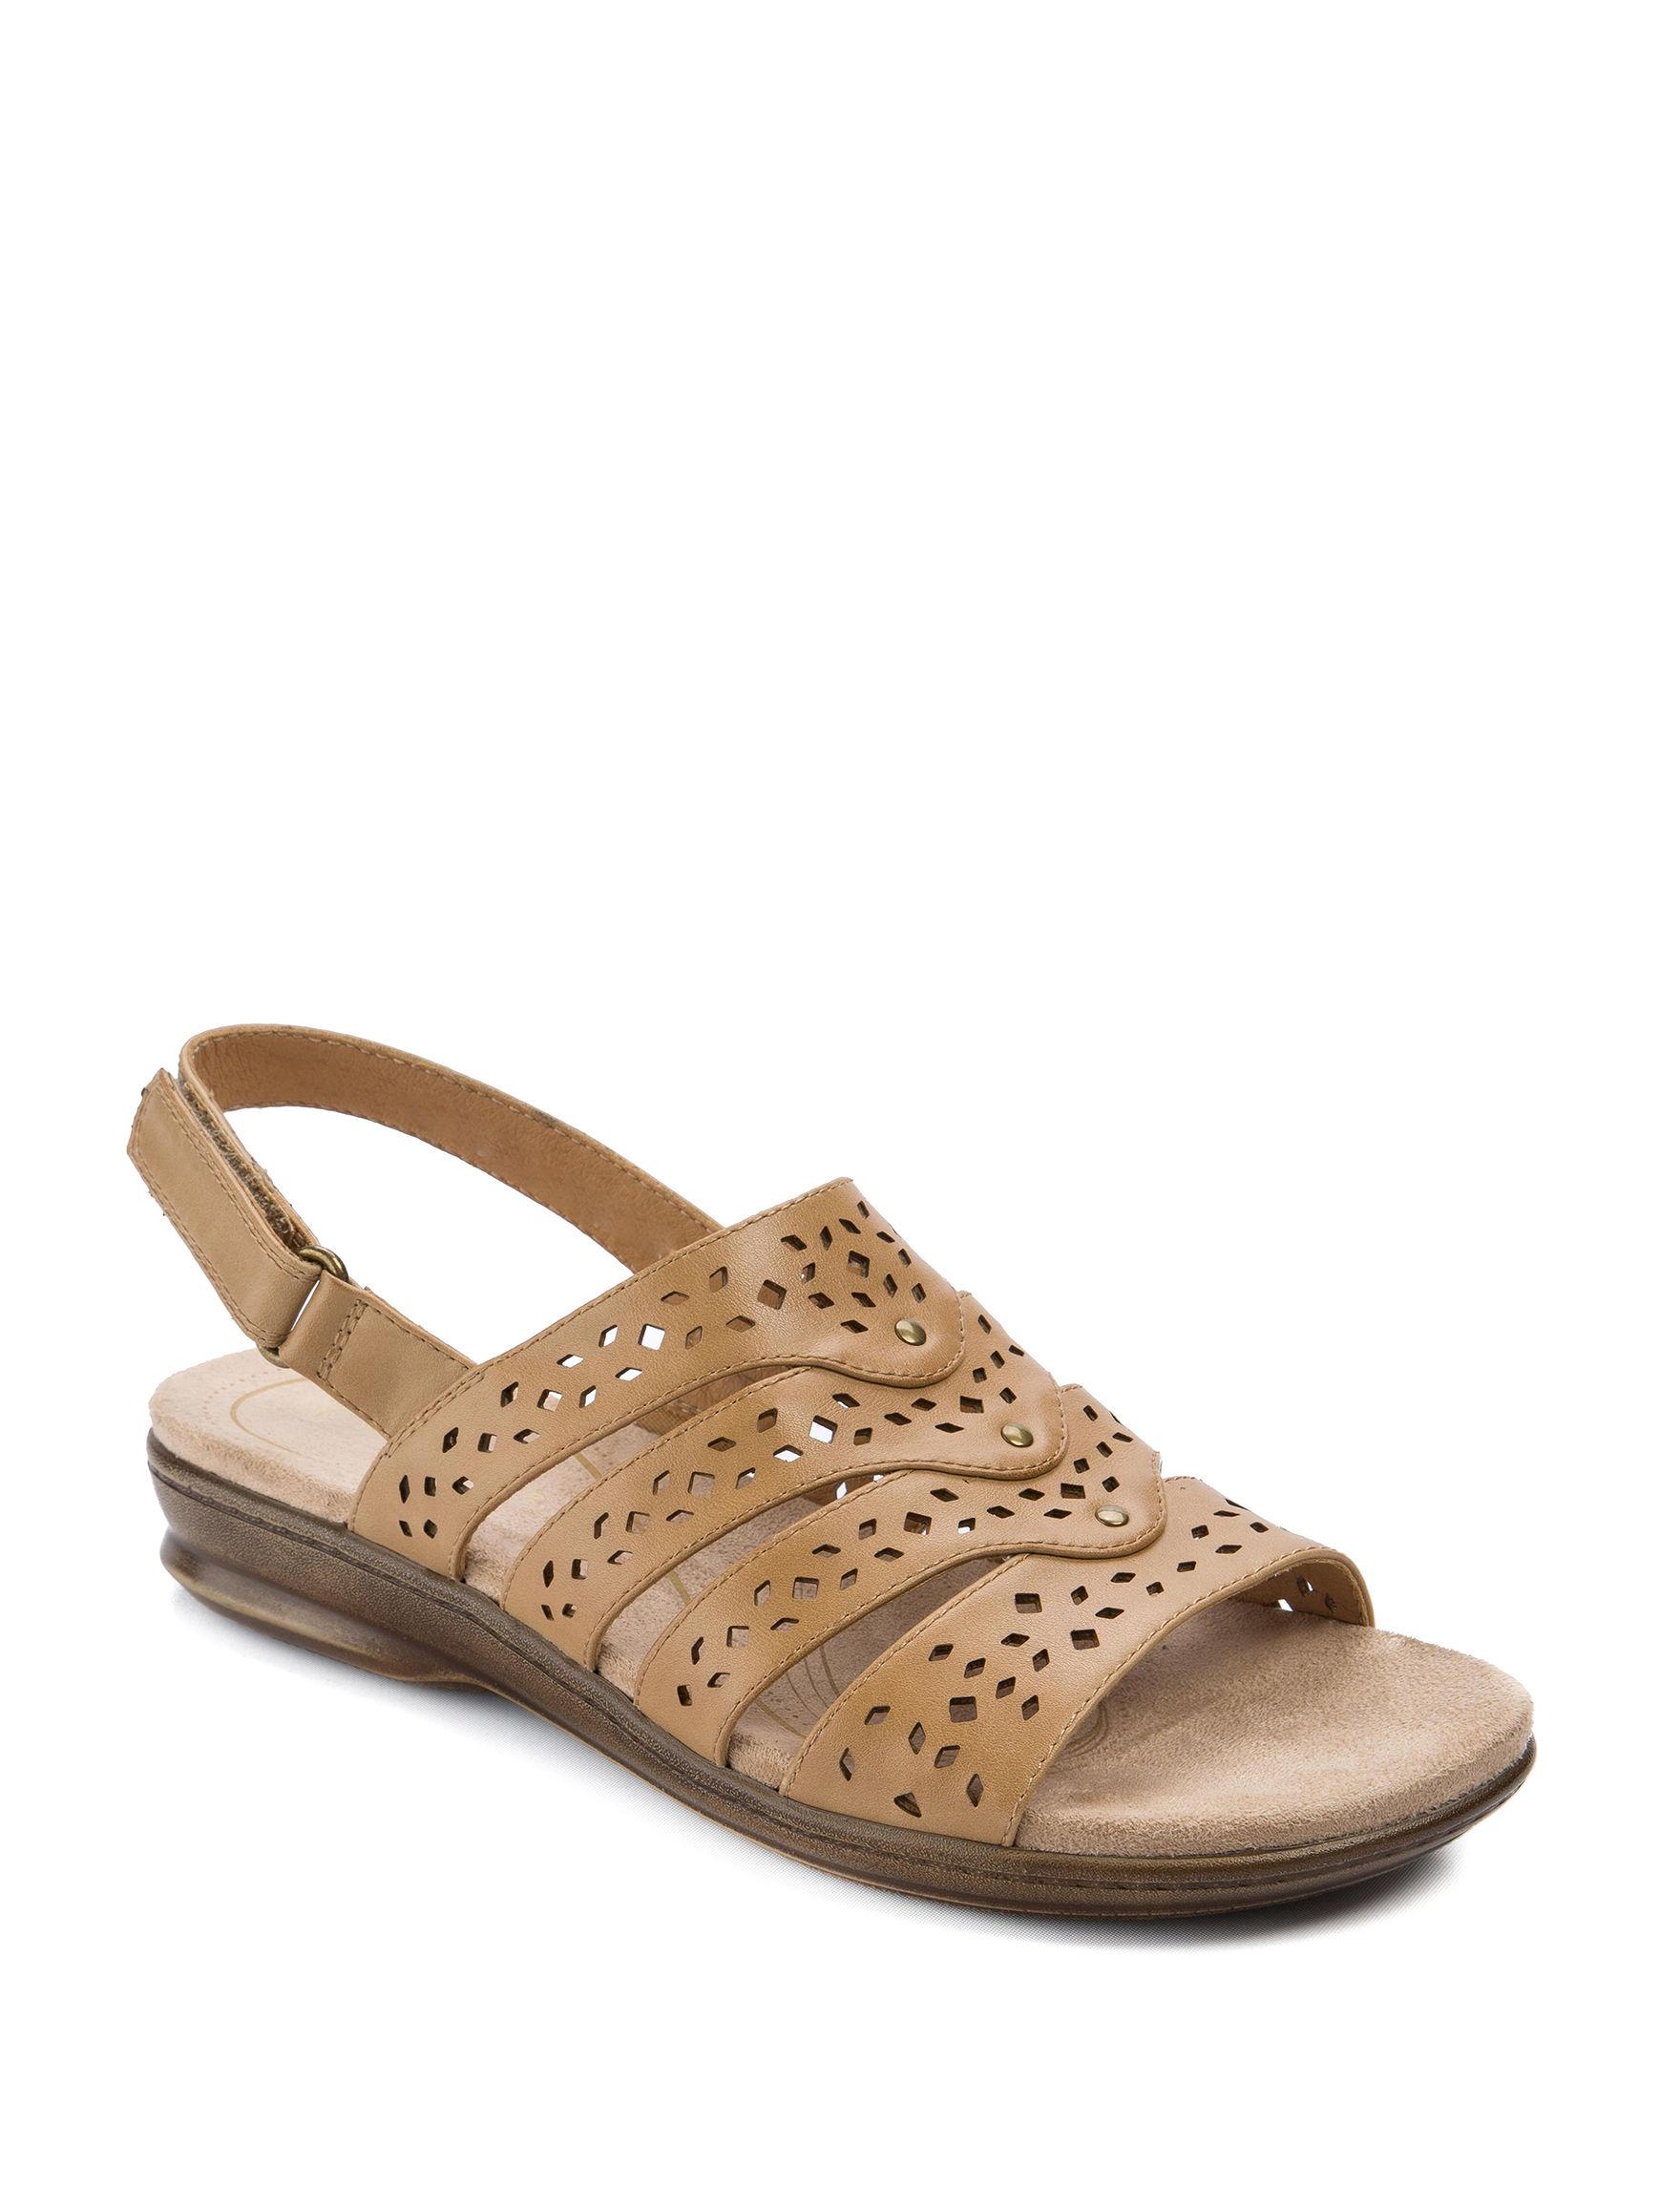 Wear. Ever. Tan Flat Sandals Footbed Comfort